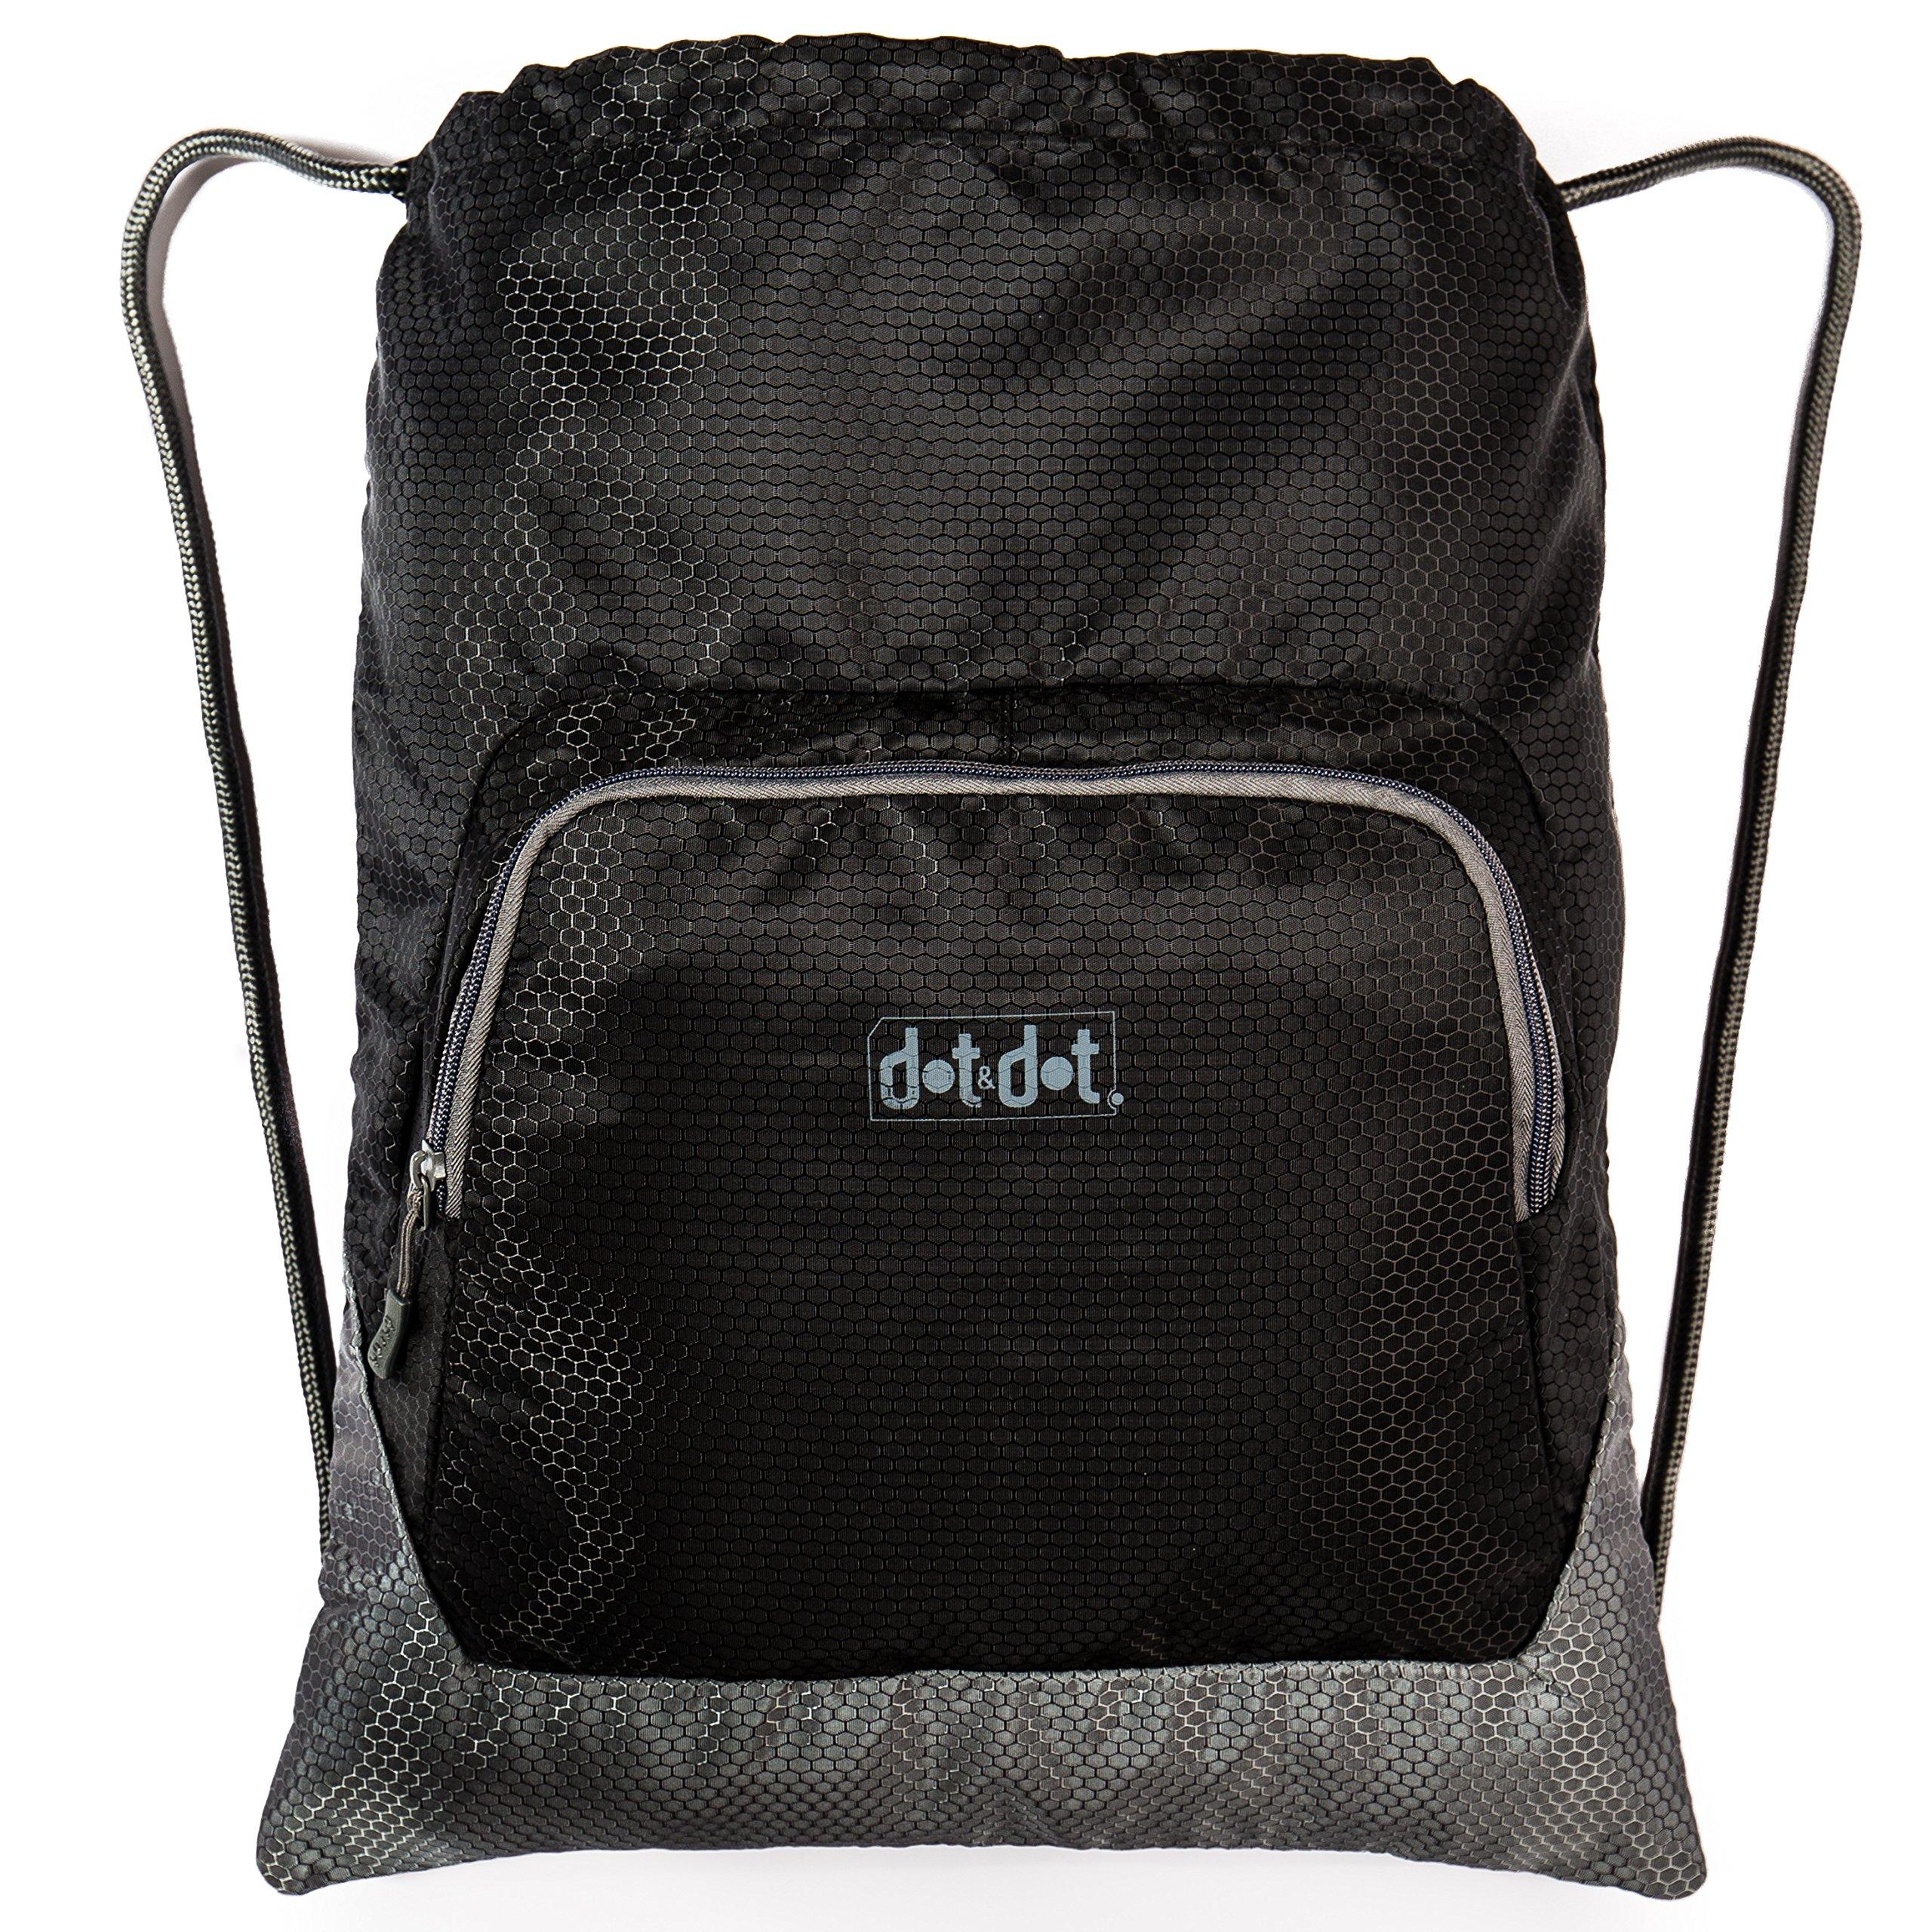 Gymsack Drawstring Bag-Water Resistant & Lightweight Backpack